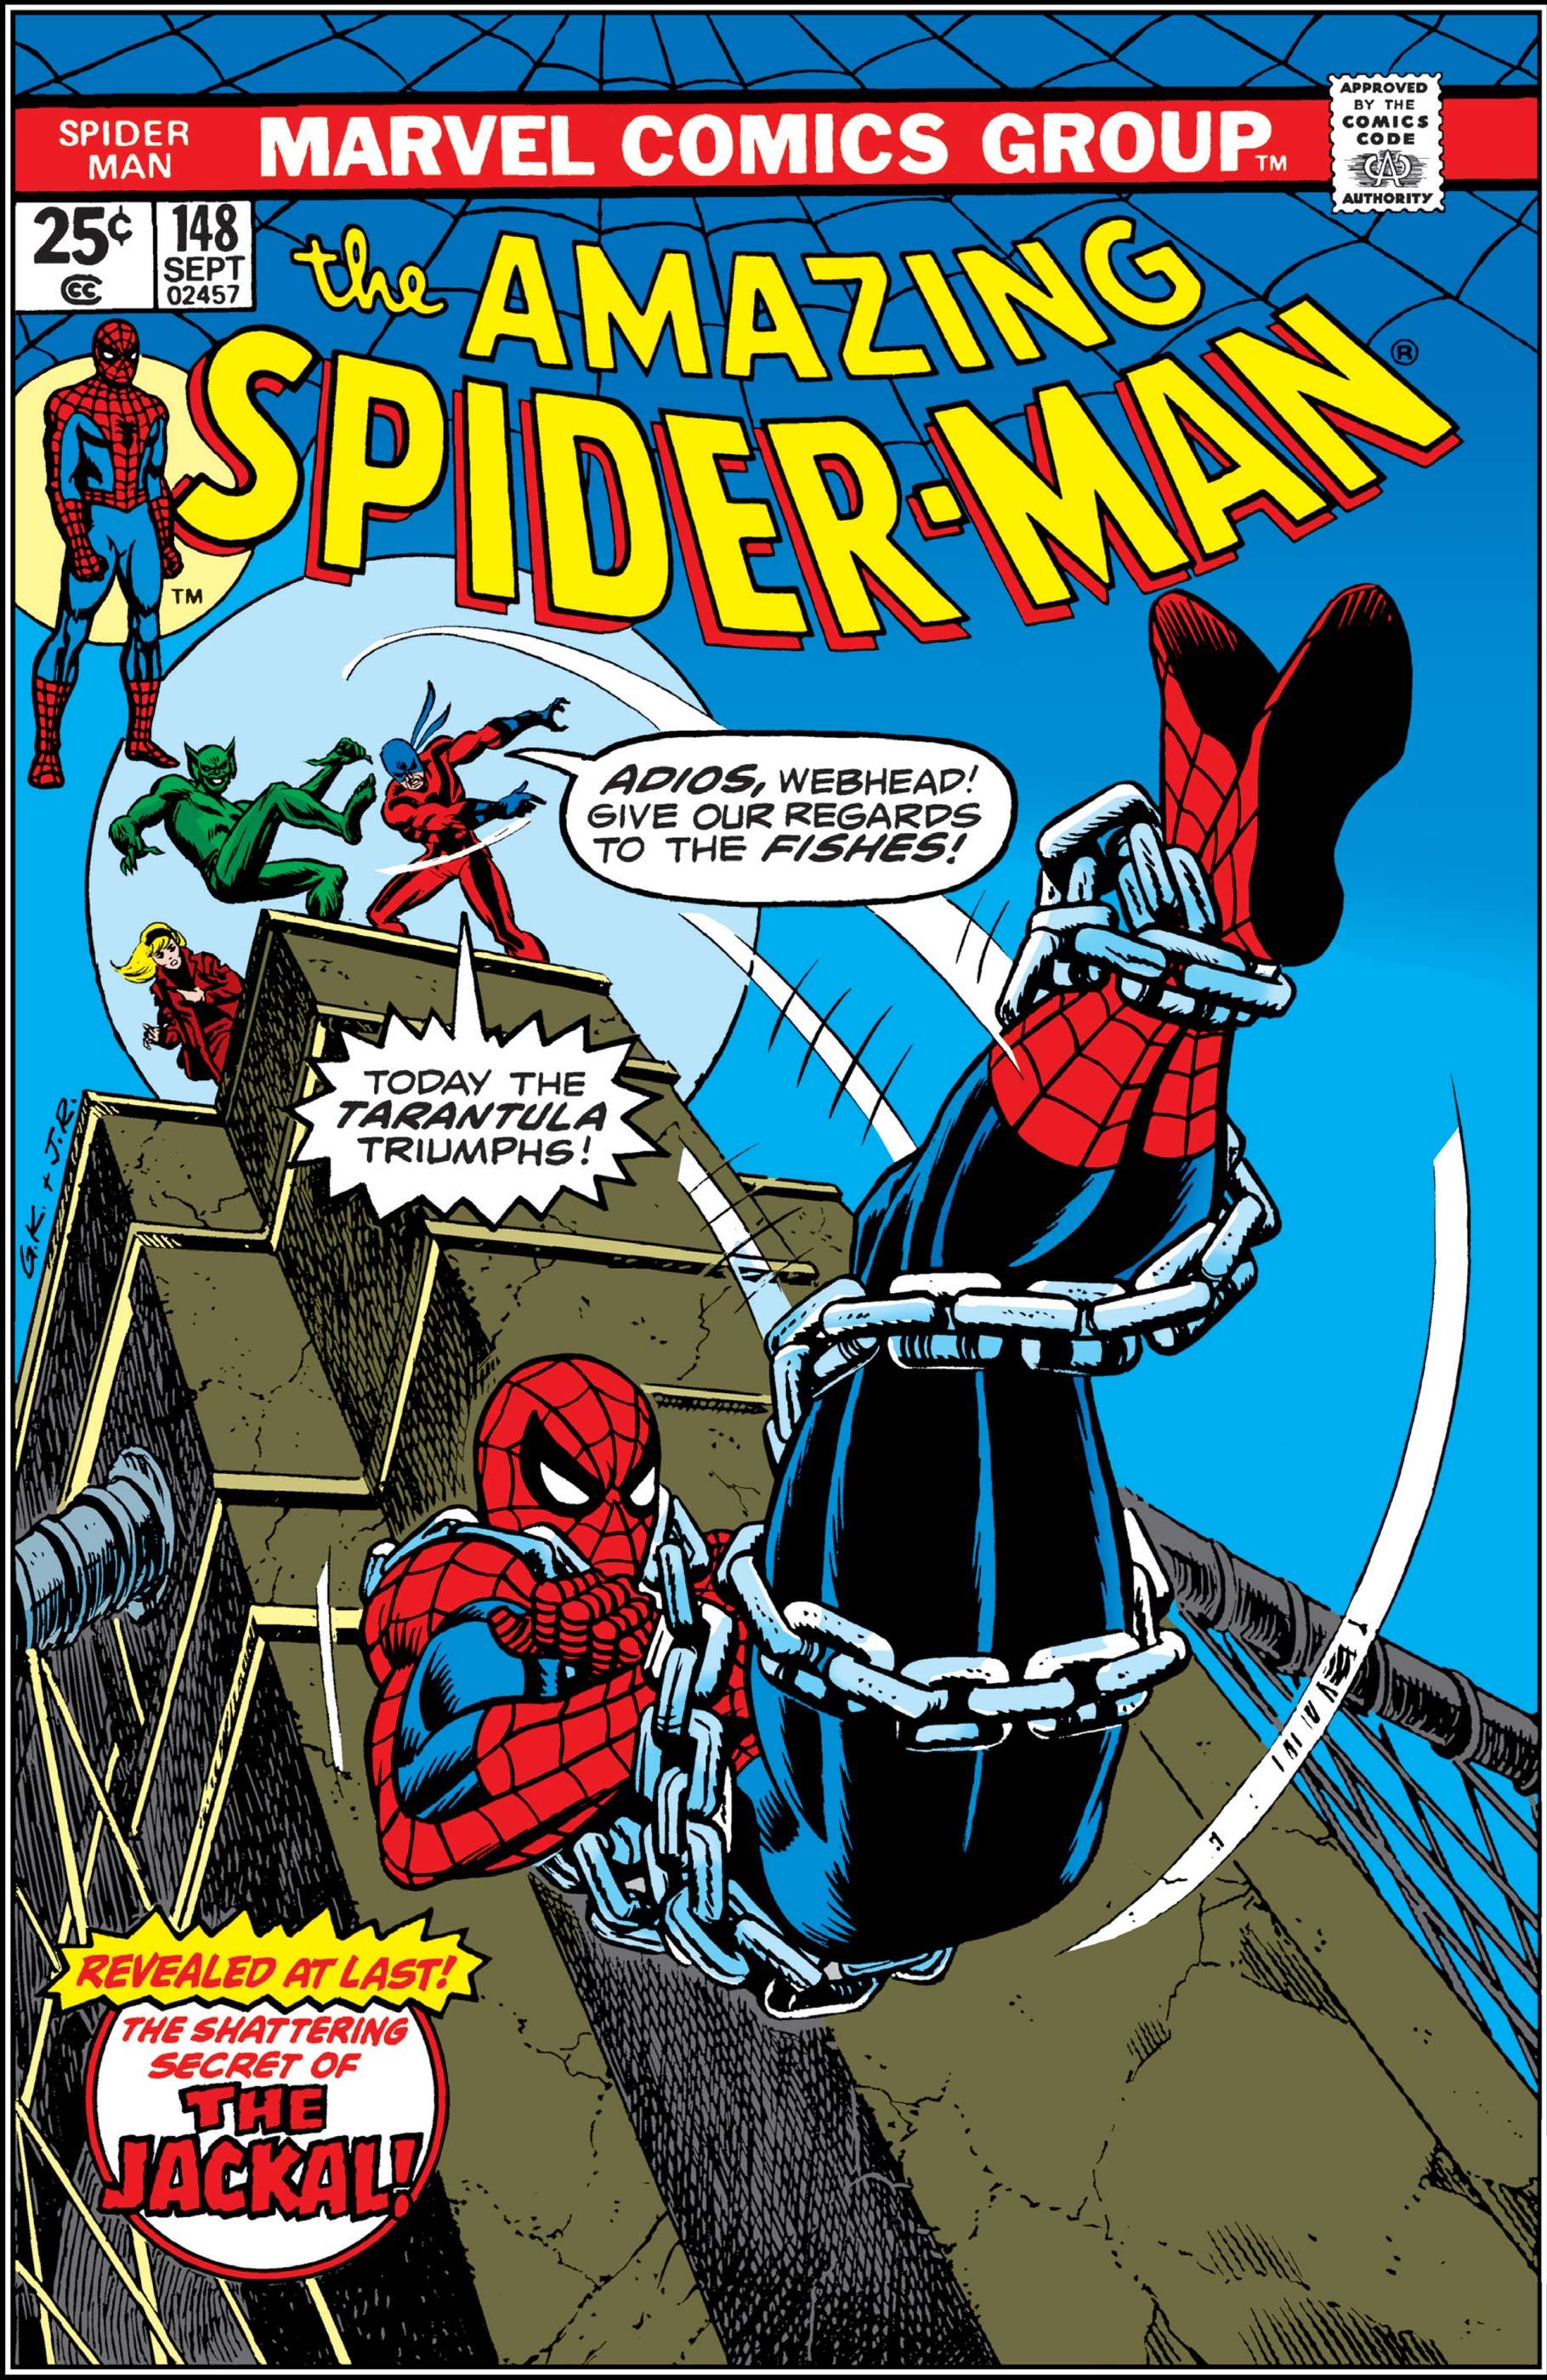 The Amazing Spider-Man (1963) #148